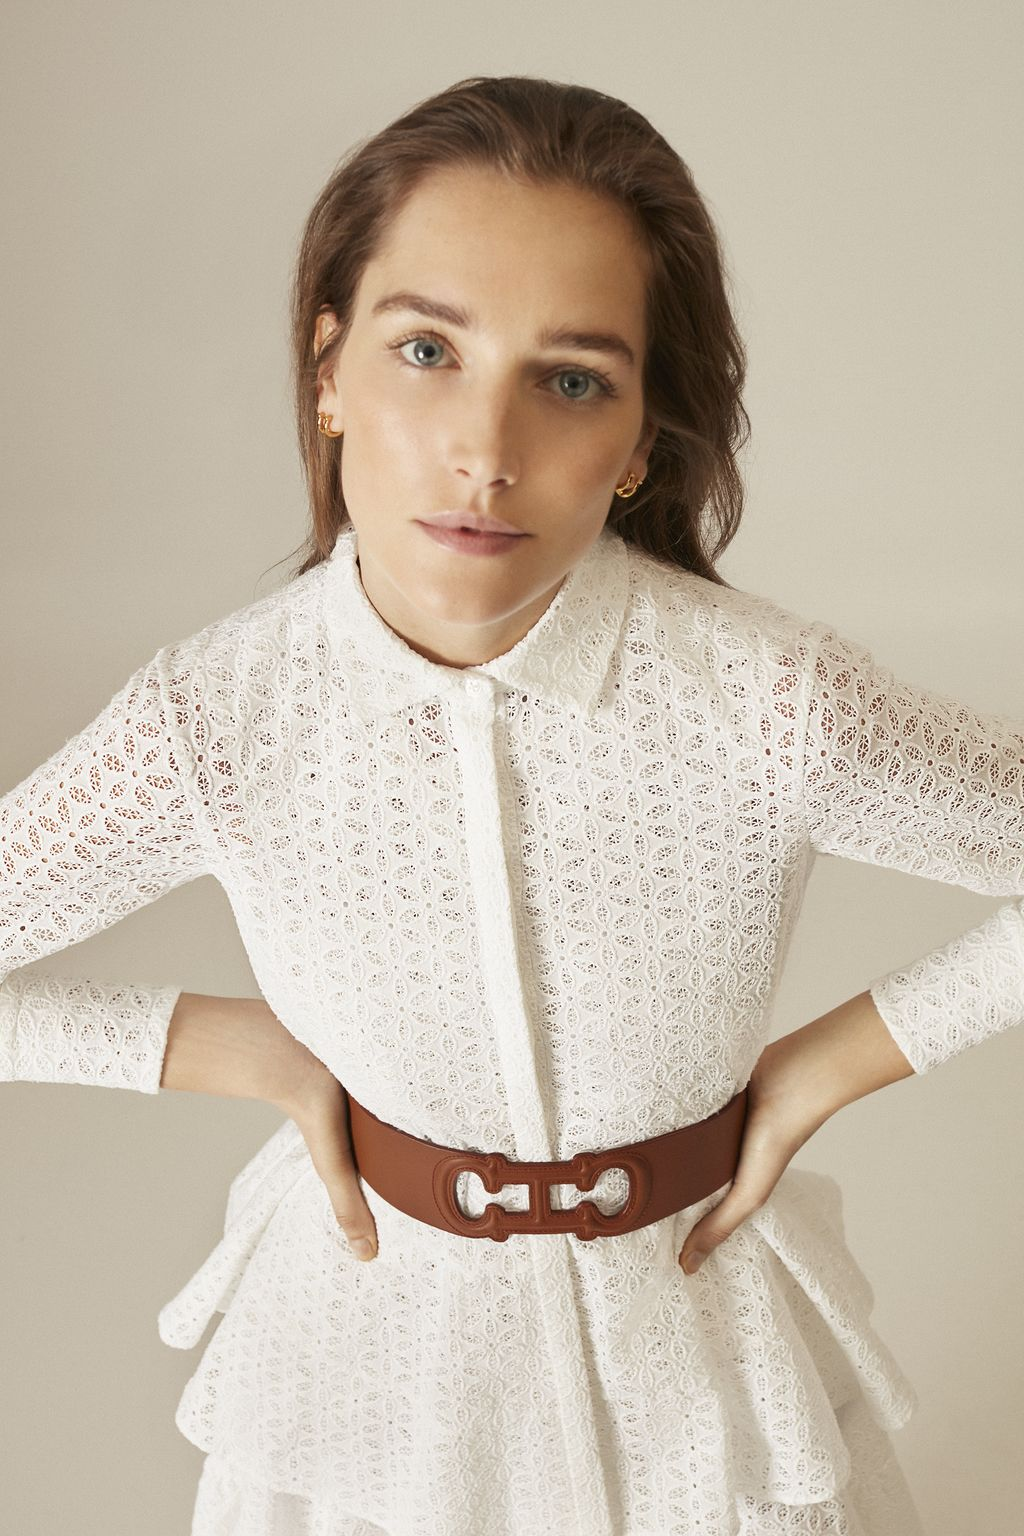 Perforated cotton peplum shirt